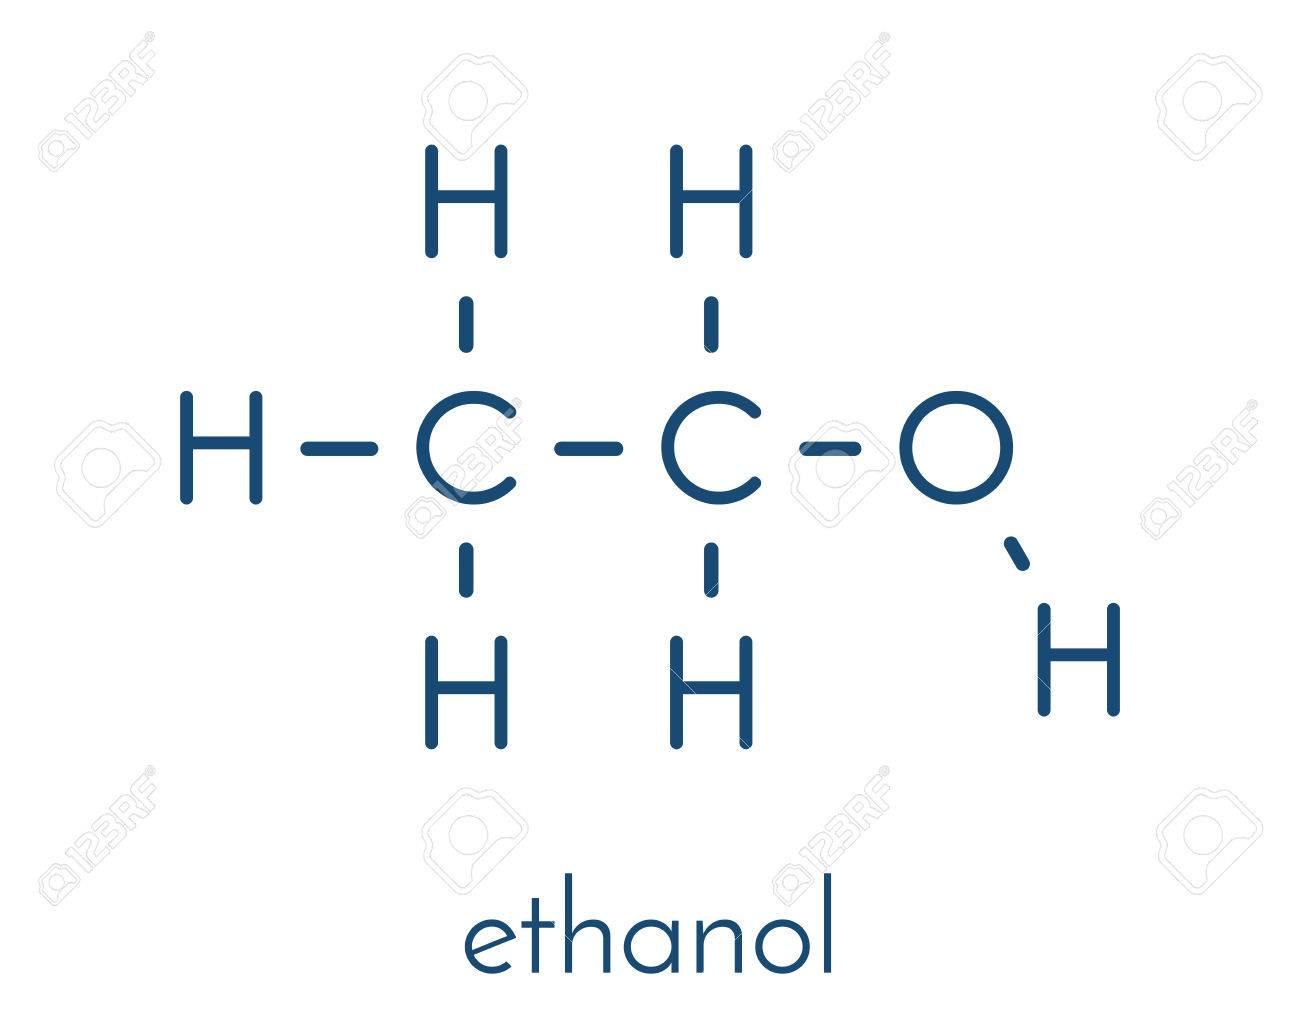 alcohol formula - Parfu kaptanband co